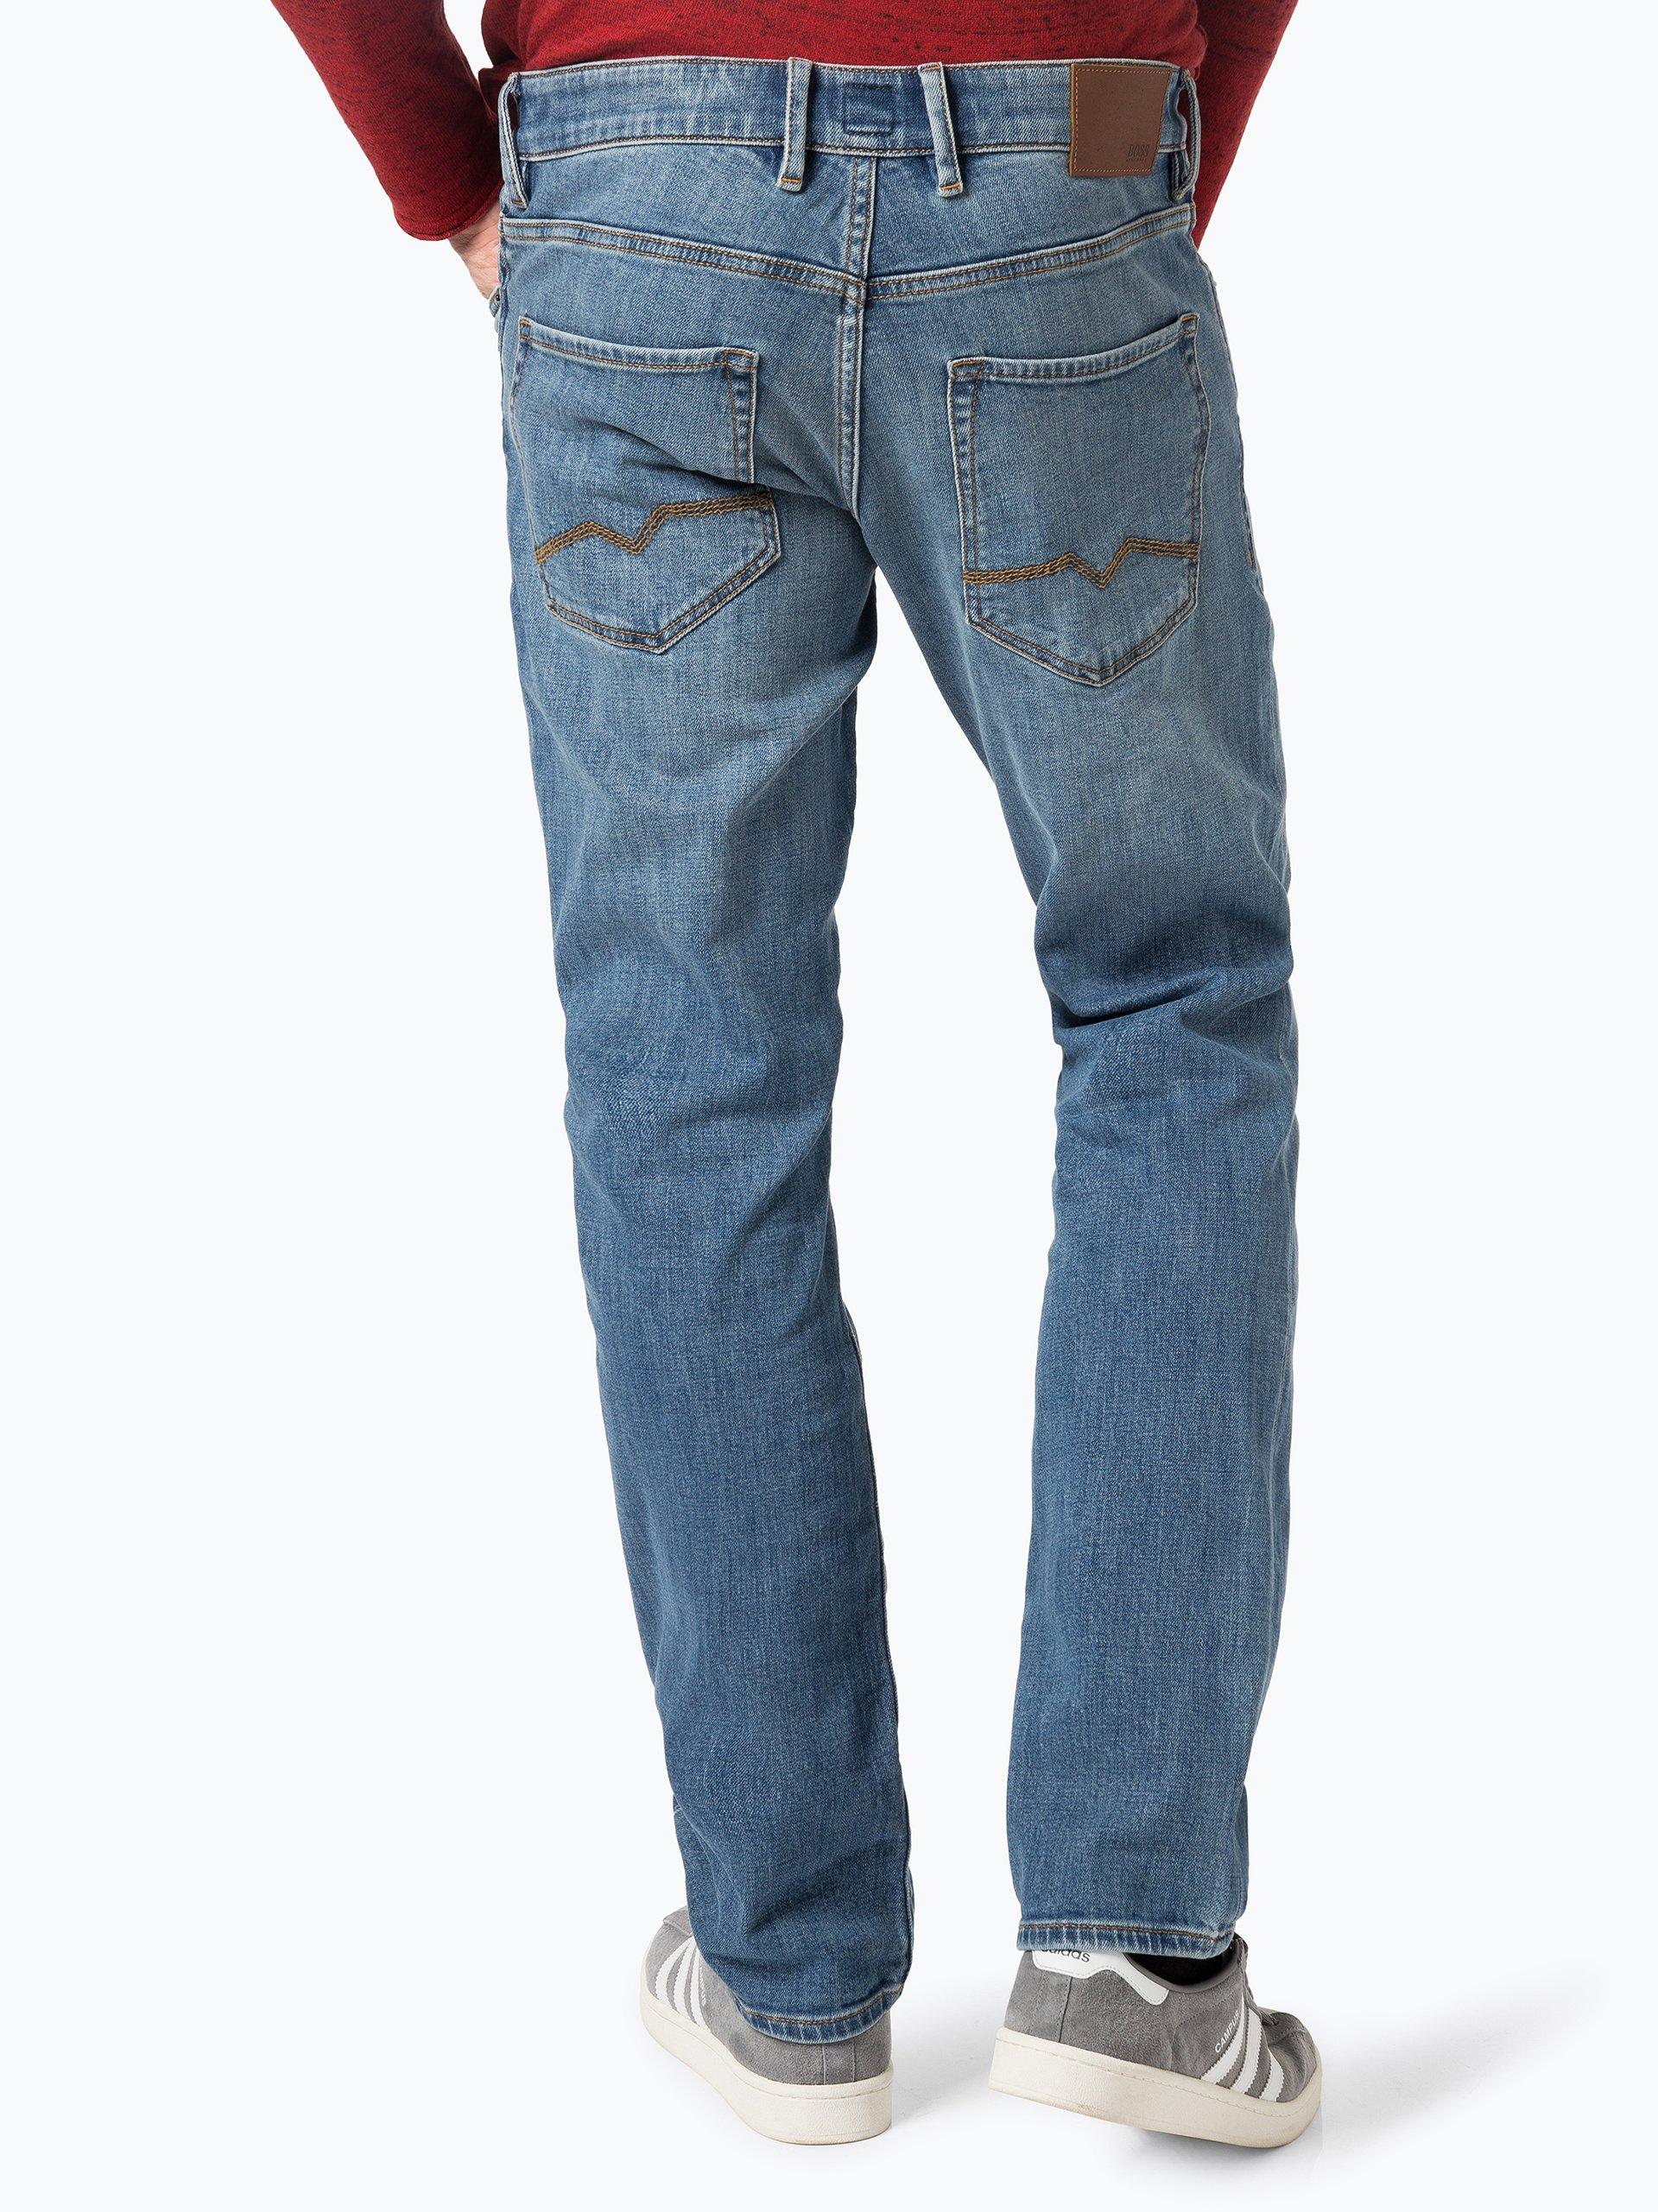 boss casual herren jeans orange 24 barcelona 2 online kaufen peek und cloppenburg de. Black Bedroom Furniture Sets. Home Design Ideas